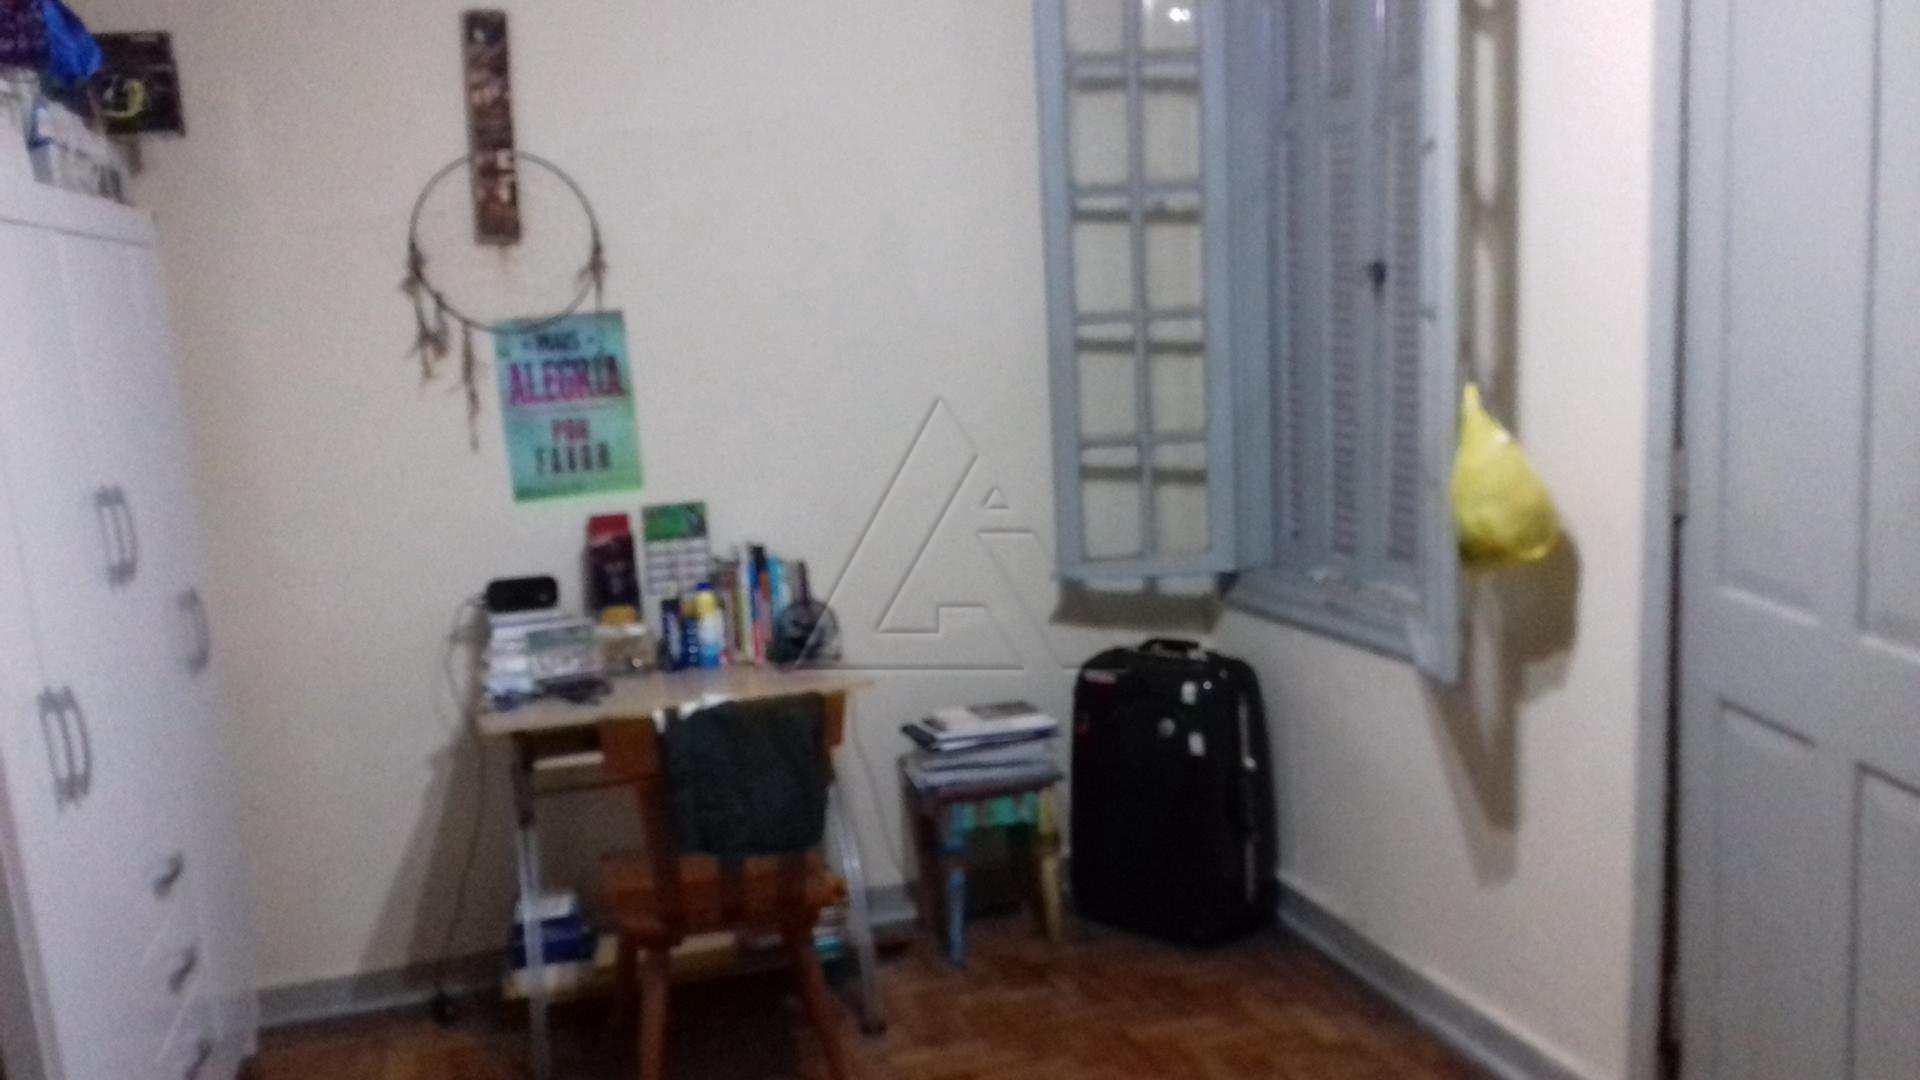 Casa com 1 dorm, Jardim Monte Kemel, São Paulo, Cod: 2950